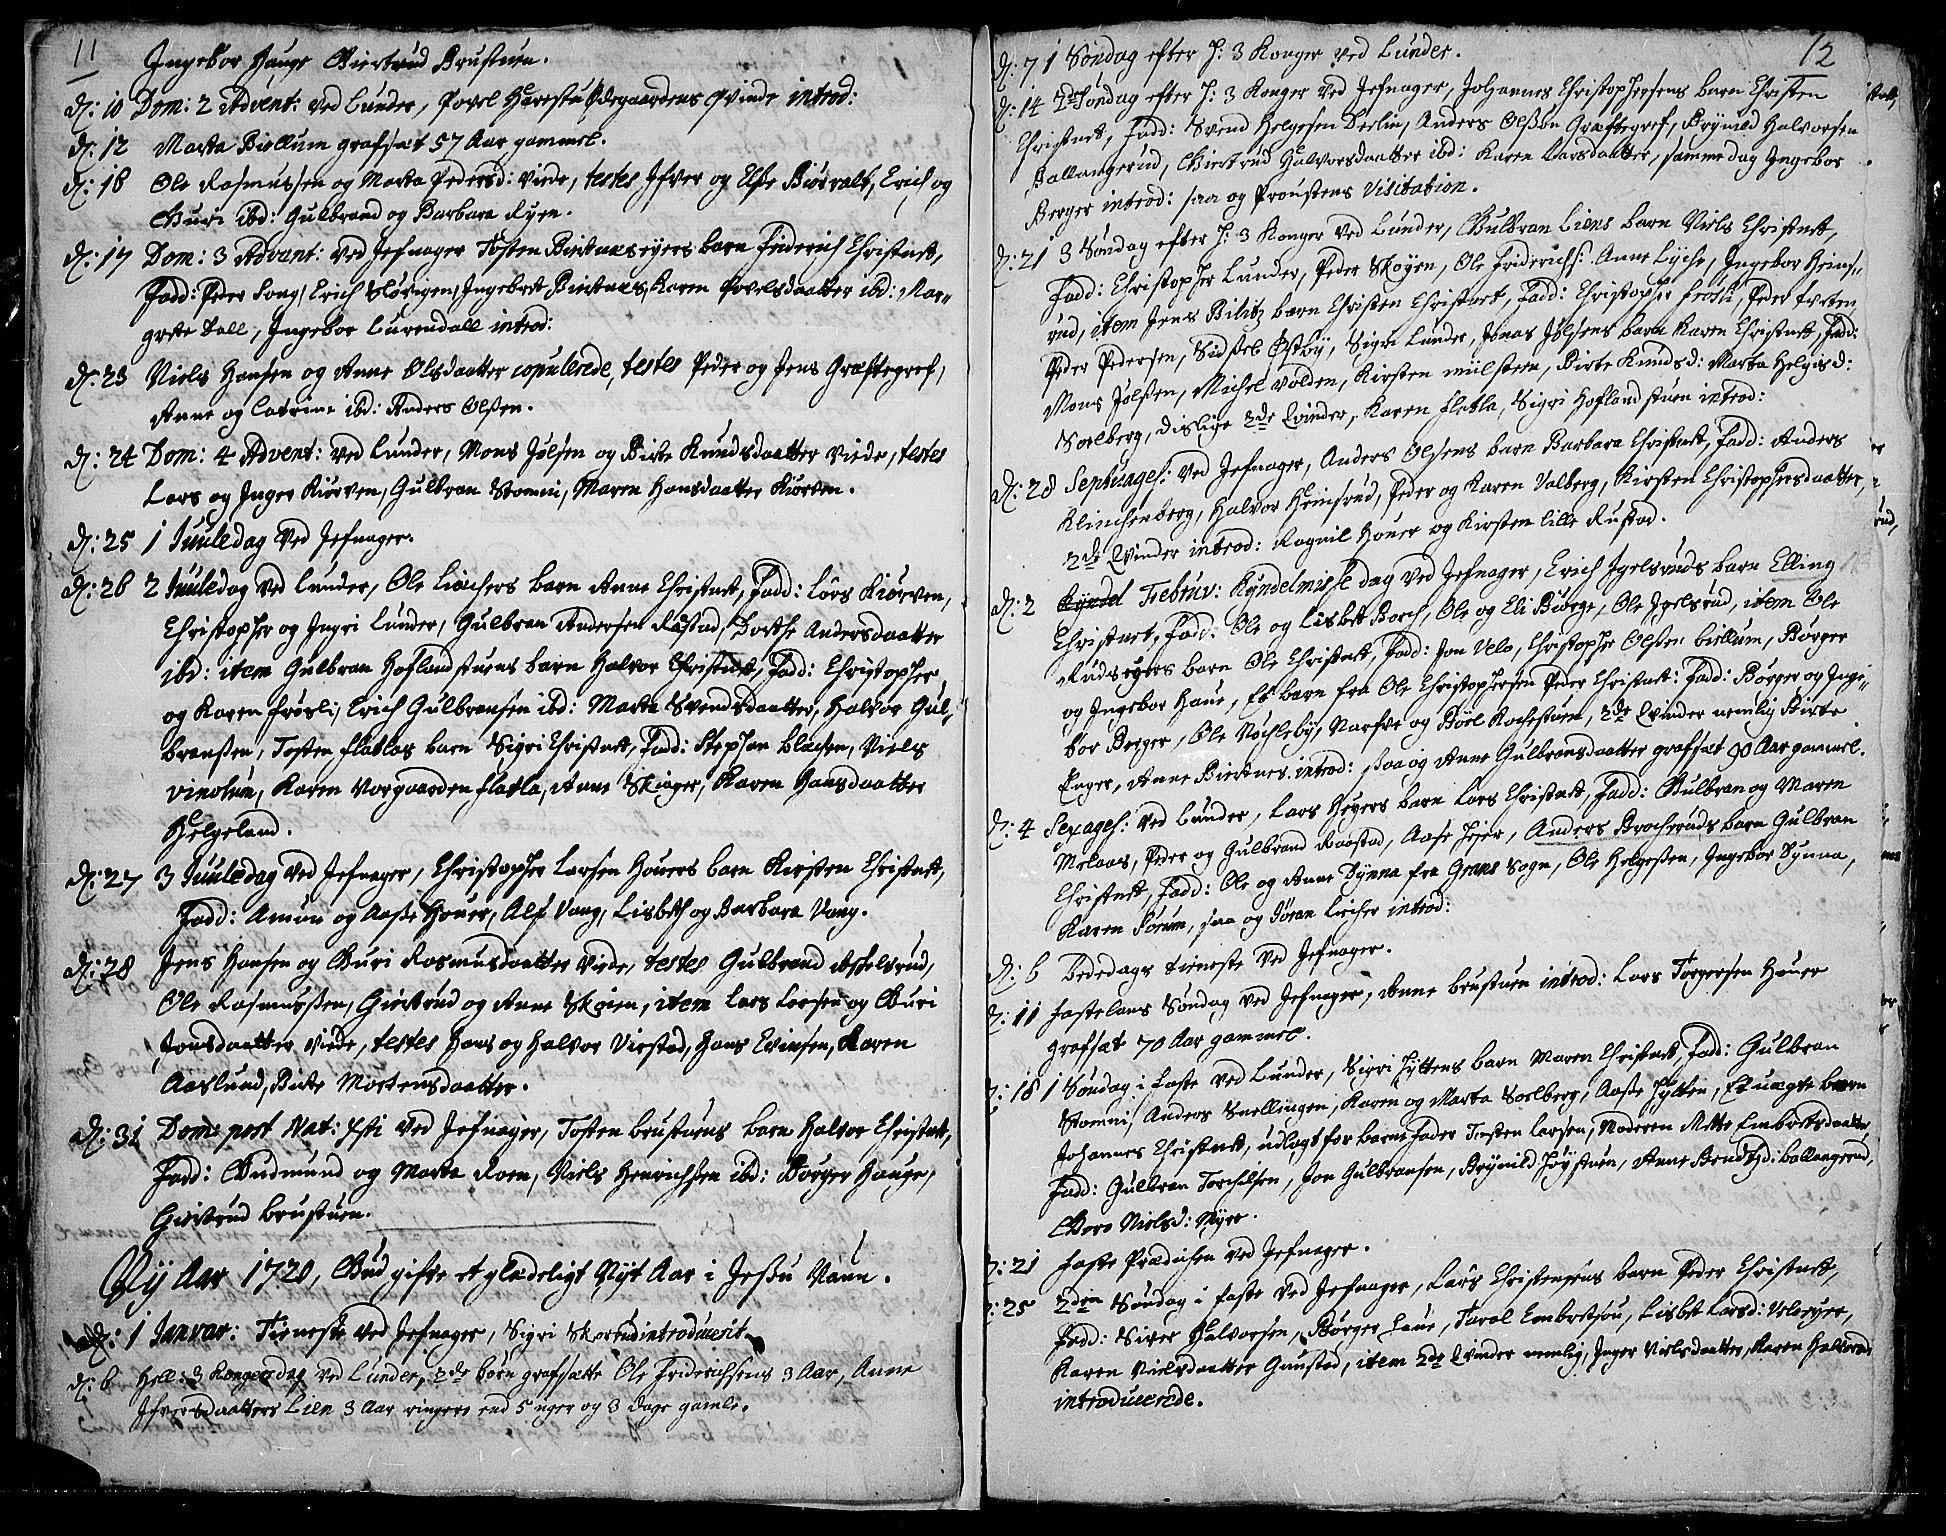 SAH, Jevnaker prestekontor, Ministerialbok nr. 1, 1718-1725, s. 11-12